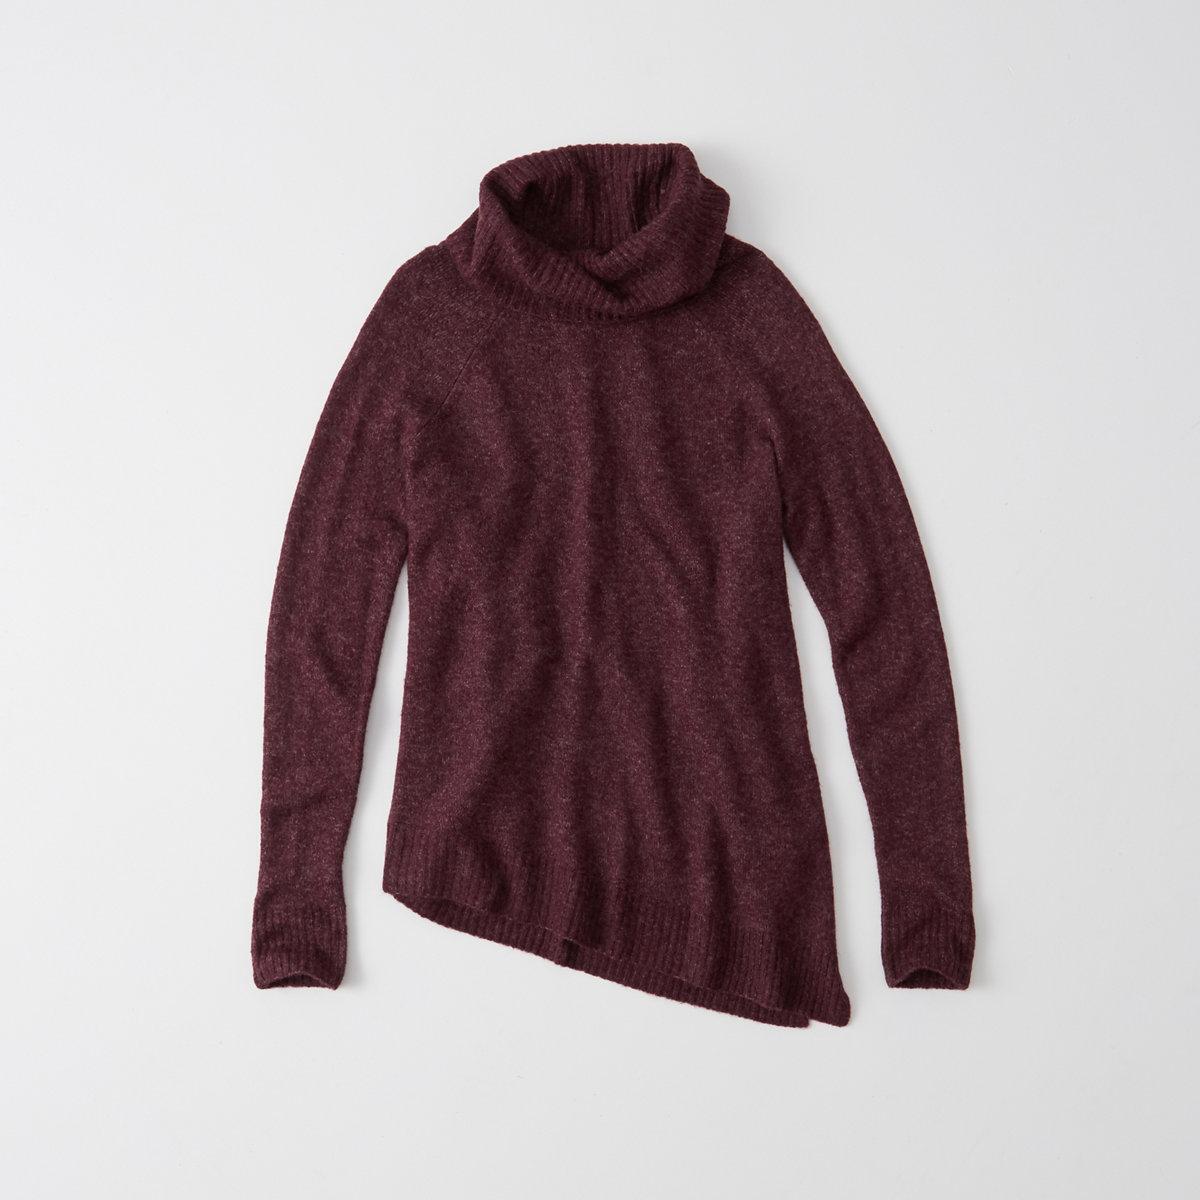 Asymmetrical Turtleneck Sweater